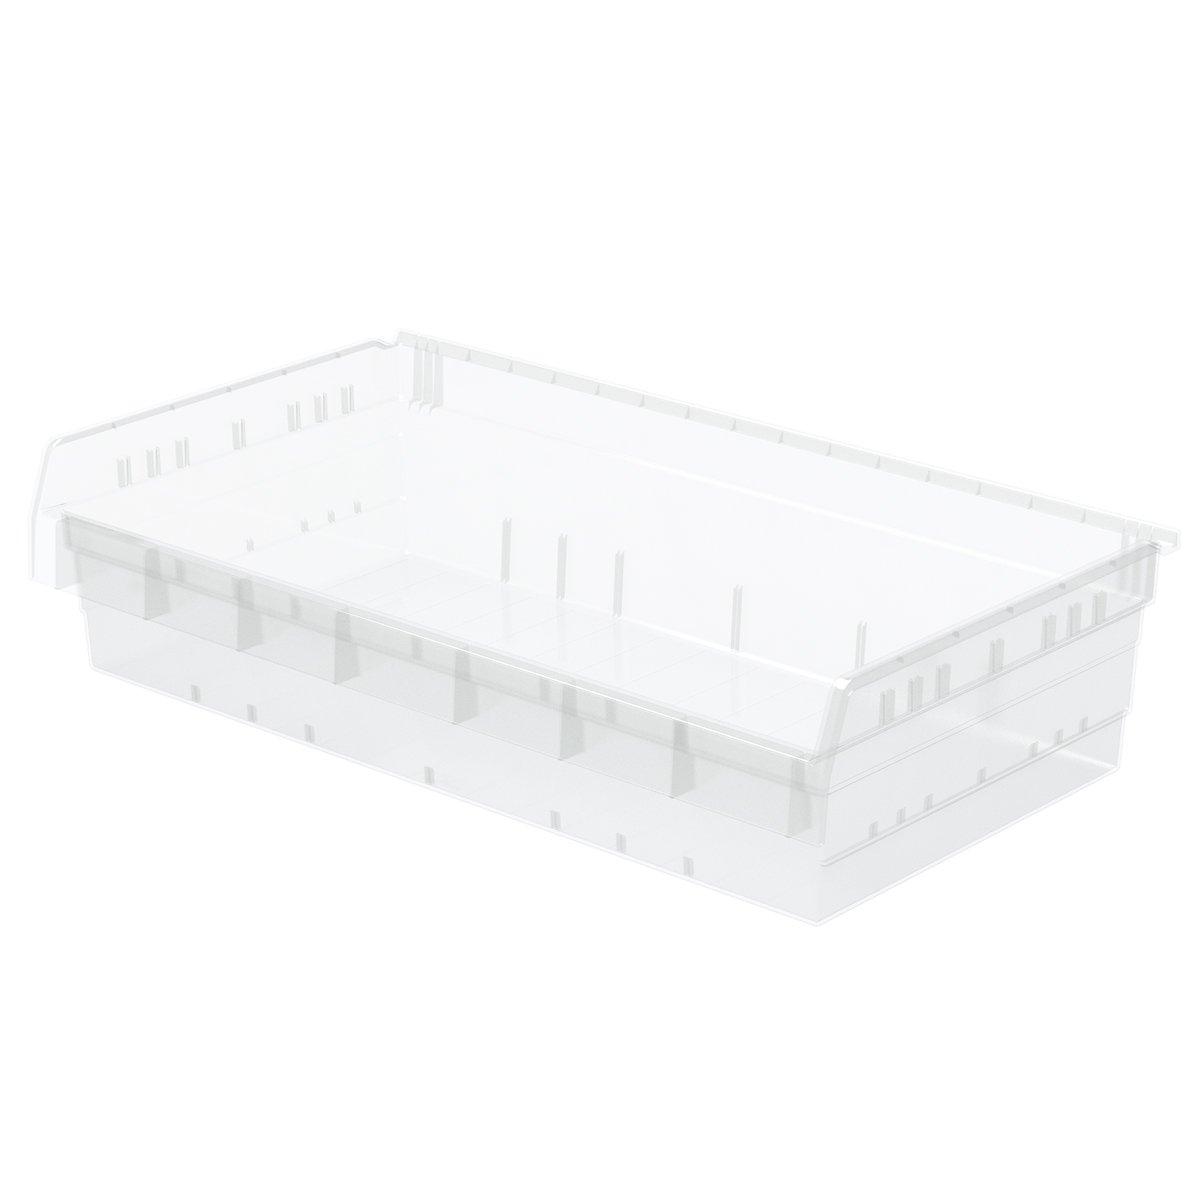 4-Pack Blue Akro-Mils 30838 ShelfMax 8 Plastic Nesting Shelf Bin Box 18-Inch x 33-Inch x 8-Inch